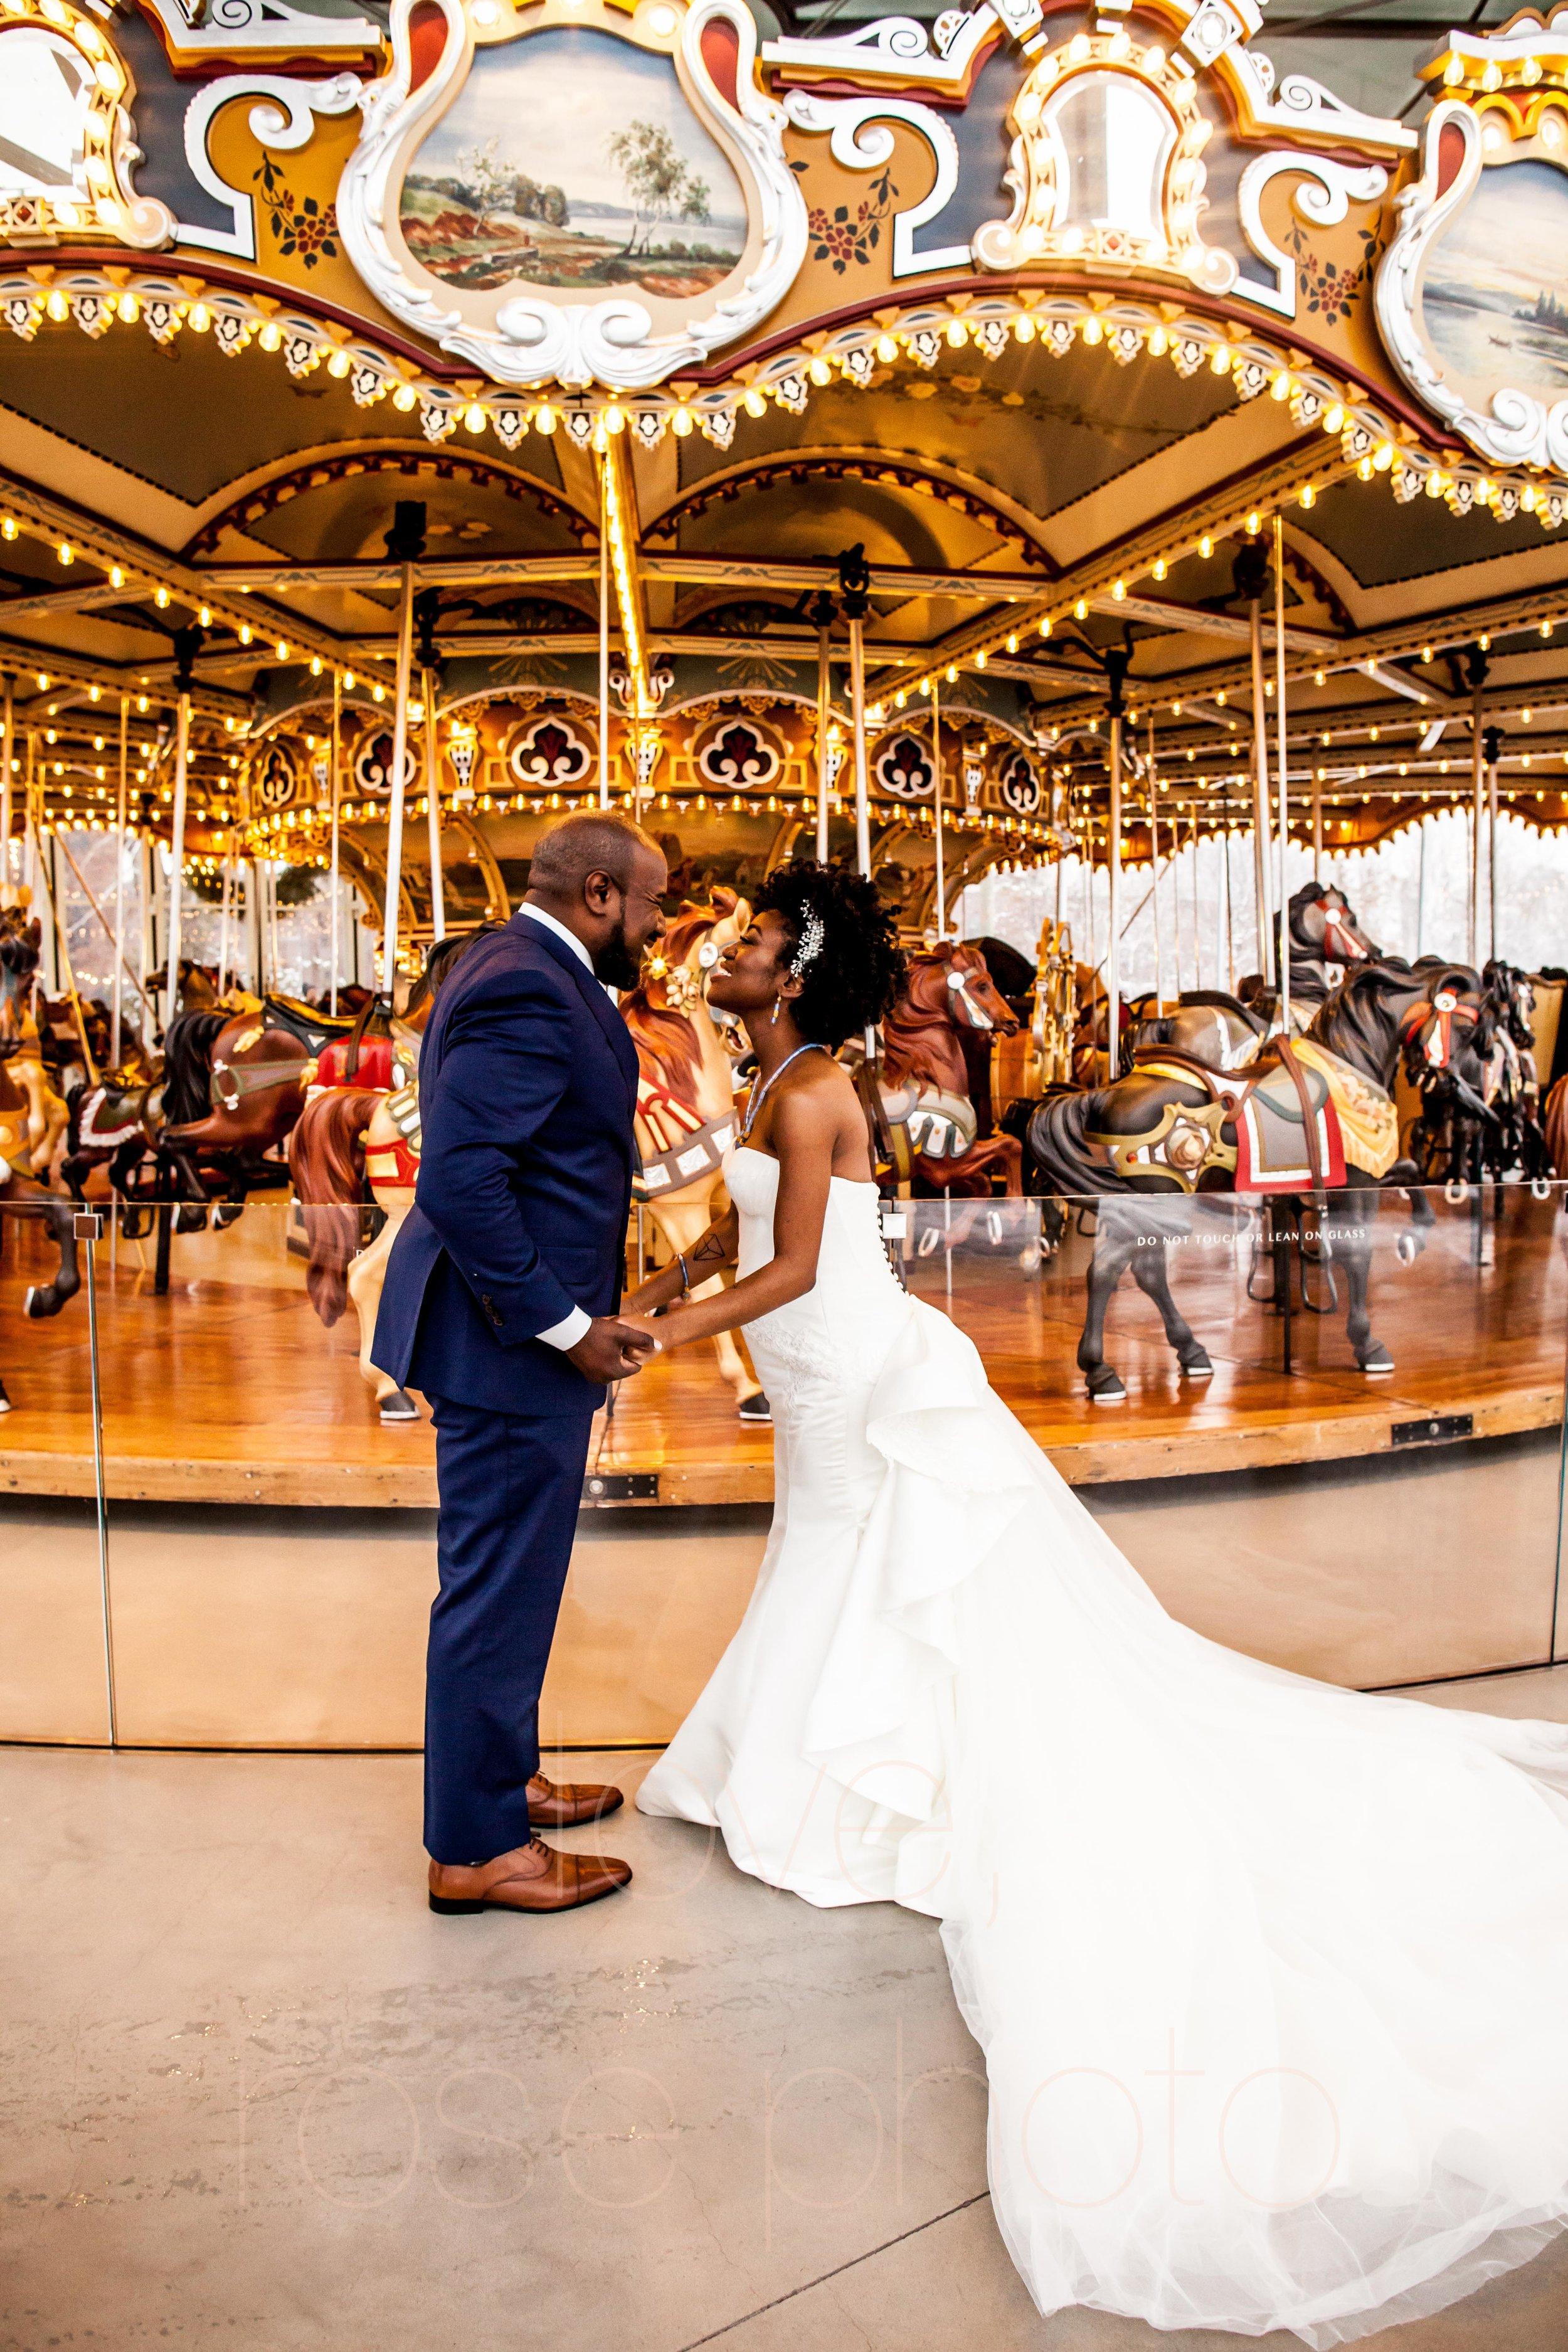 BRACEY rose photo chicago nyc wedding photographer asheville-29.jpg